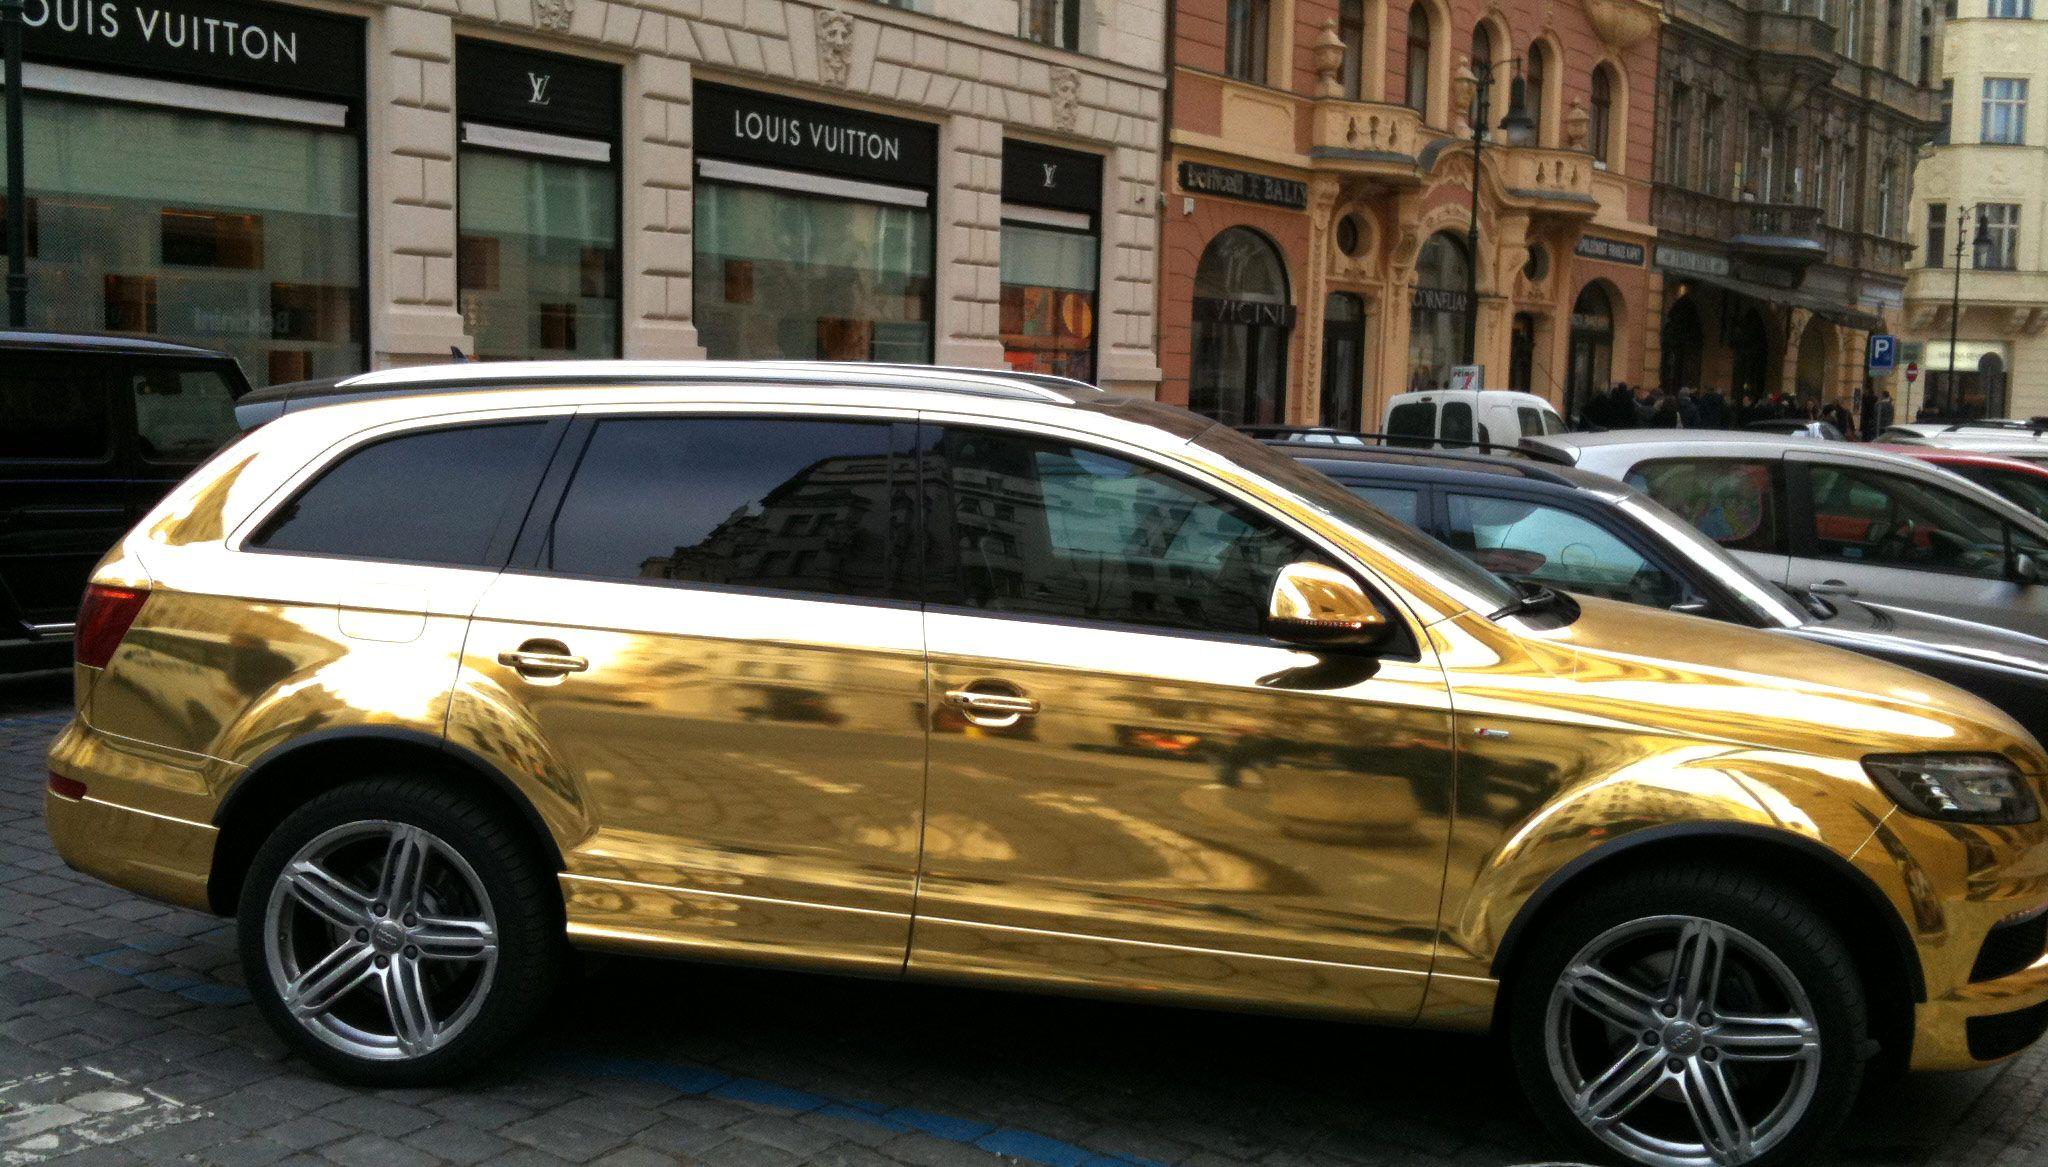 Audi Q Gold Golden Audi Q Audi Q Pinterest Audi Q Cars - Audi q7 car price